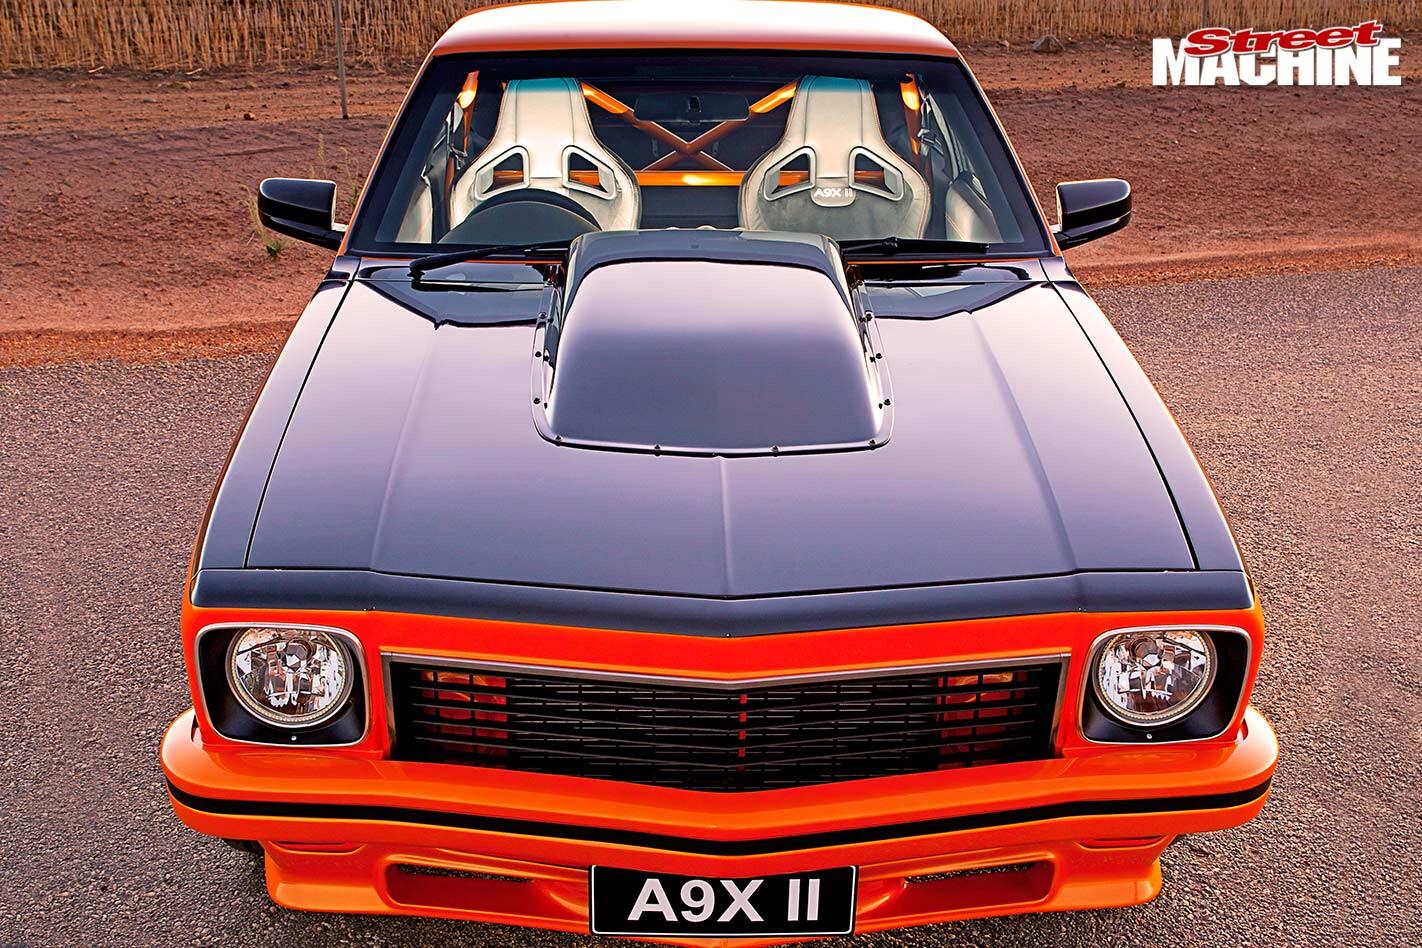 Holden Torana A9X replica front